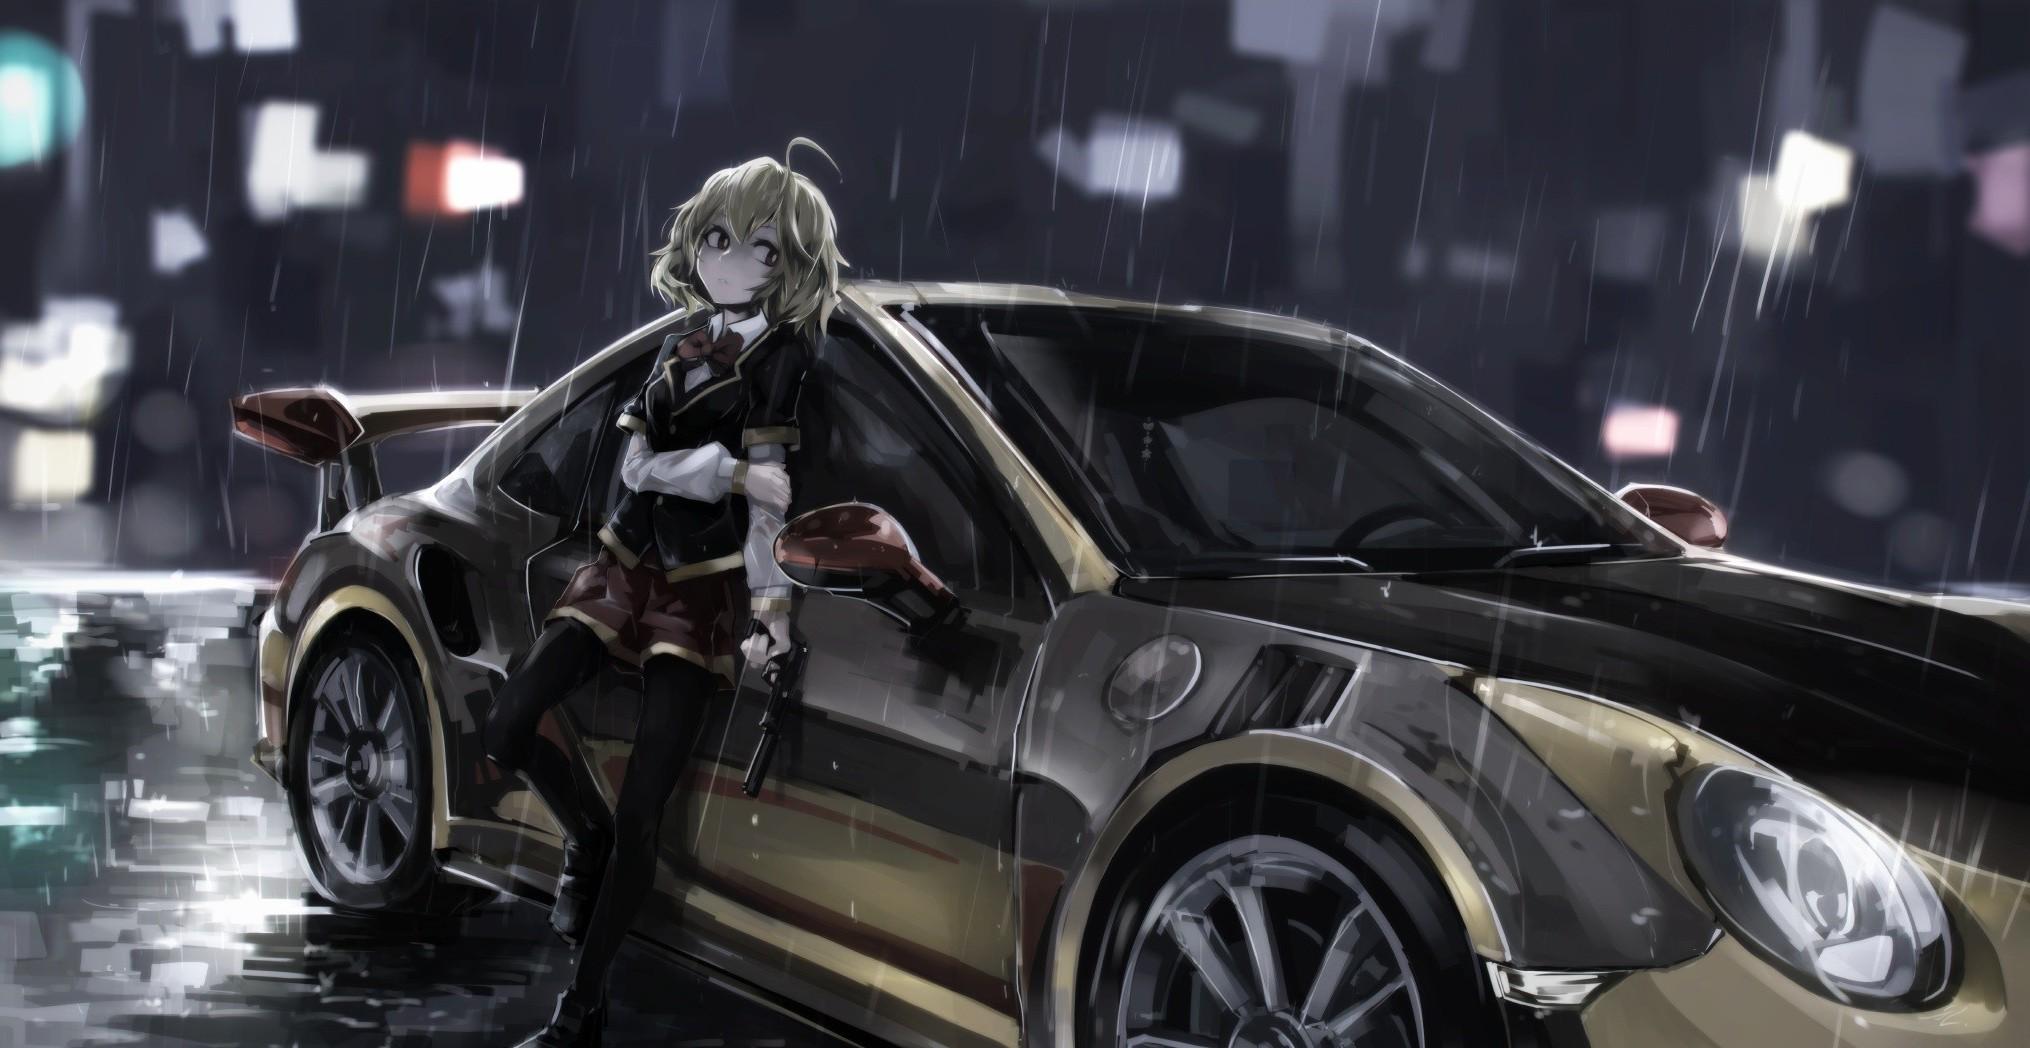 anime Anime Girls Car Porsche Hashiri Nio Akuma No Riddle 2030x1048